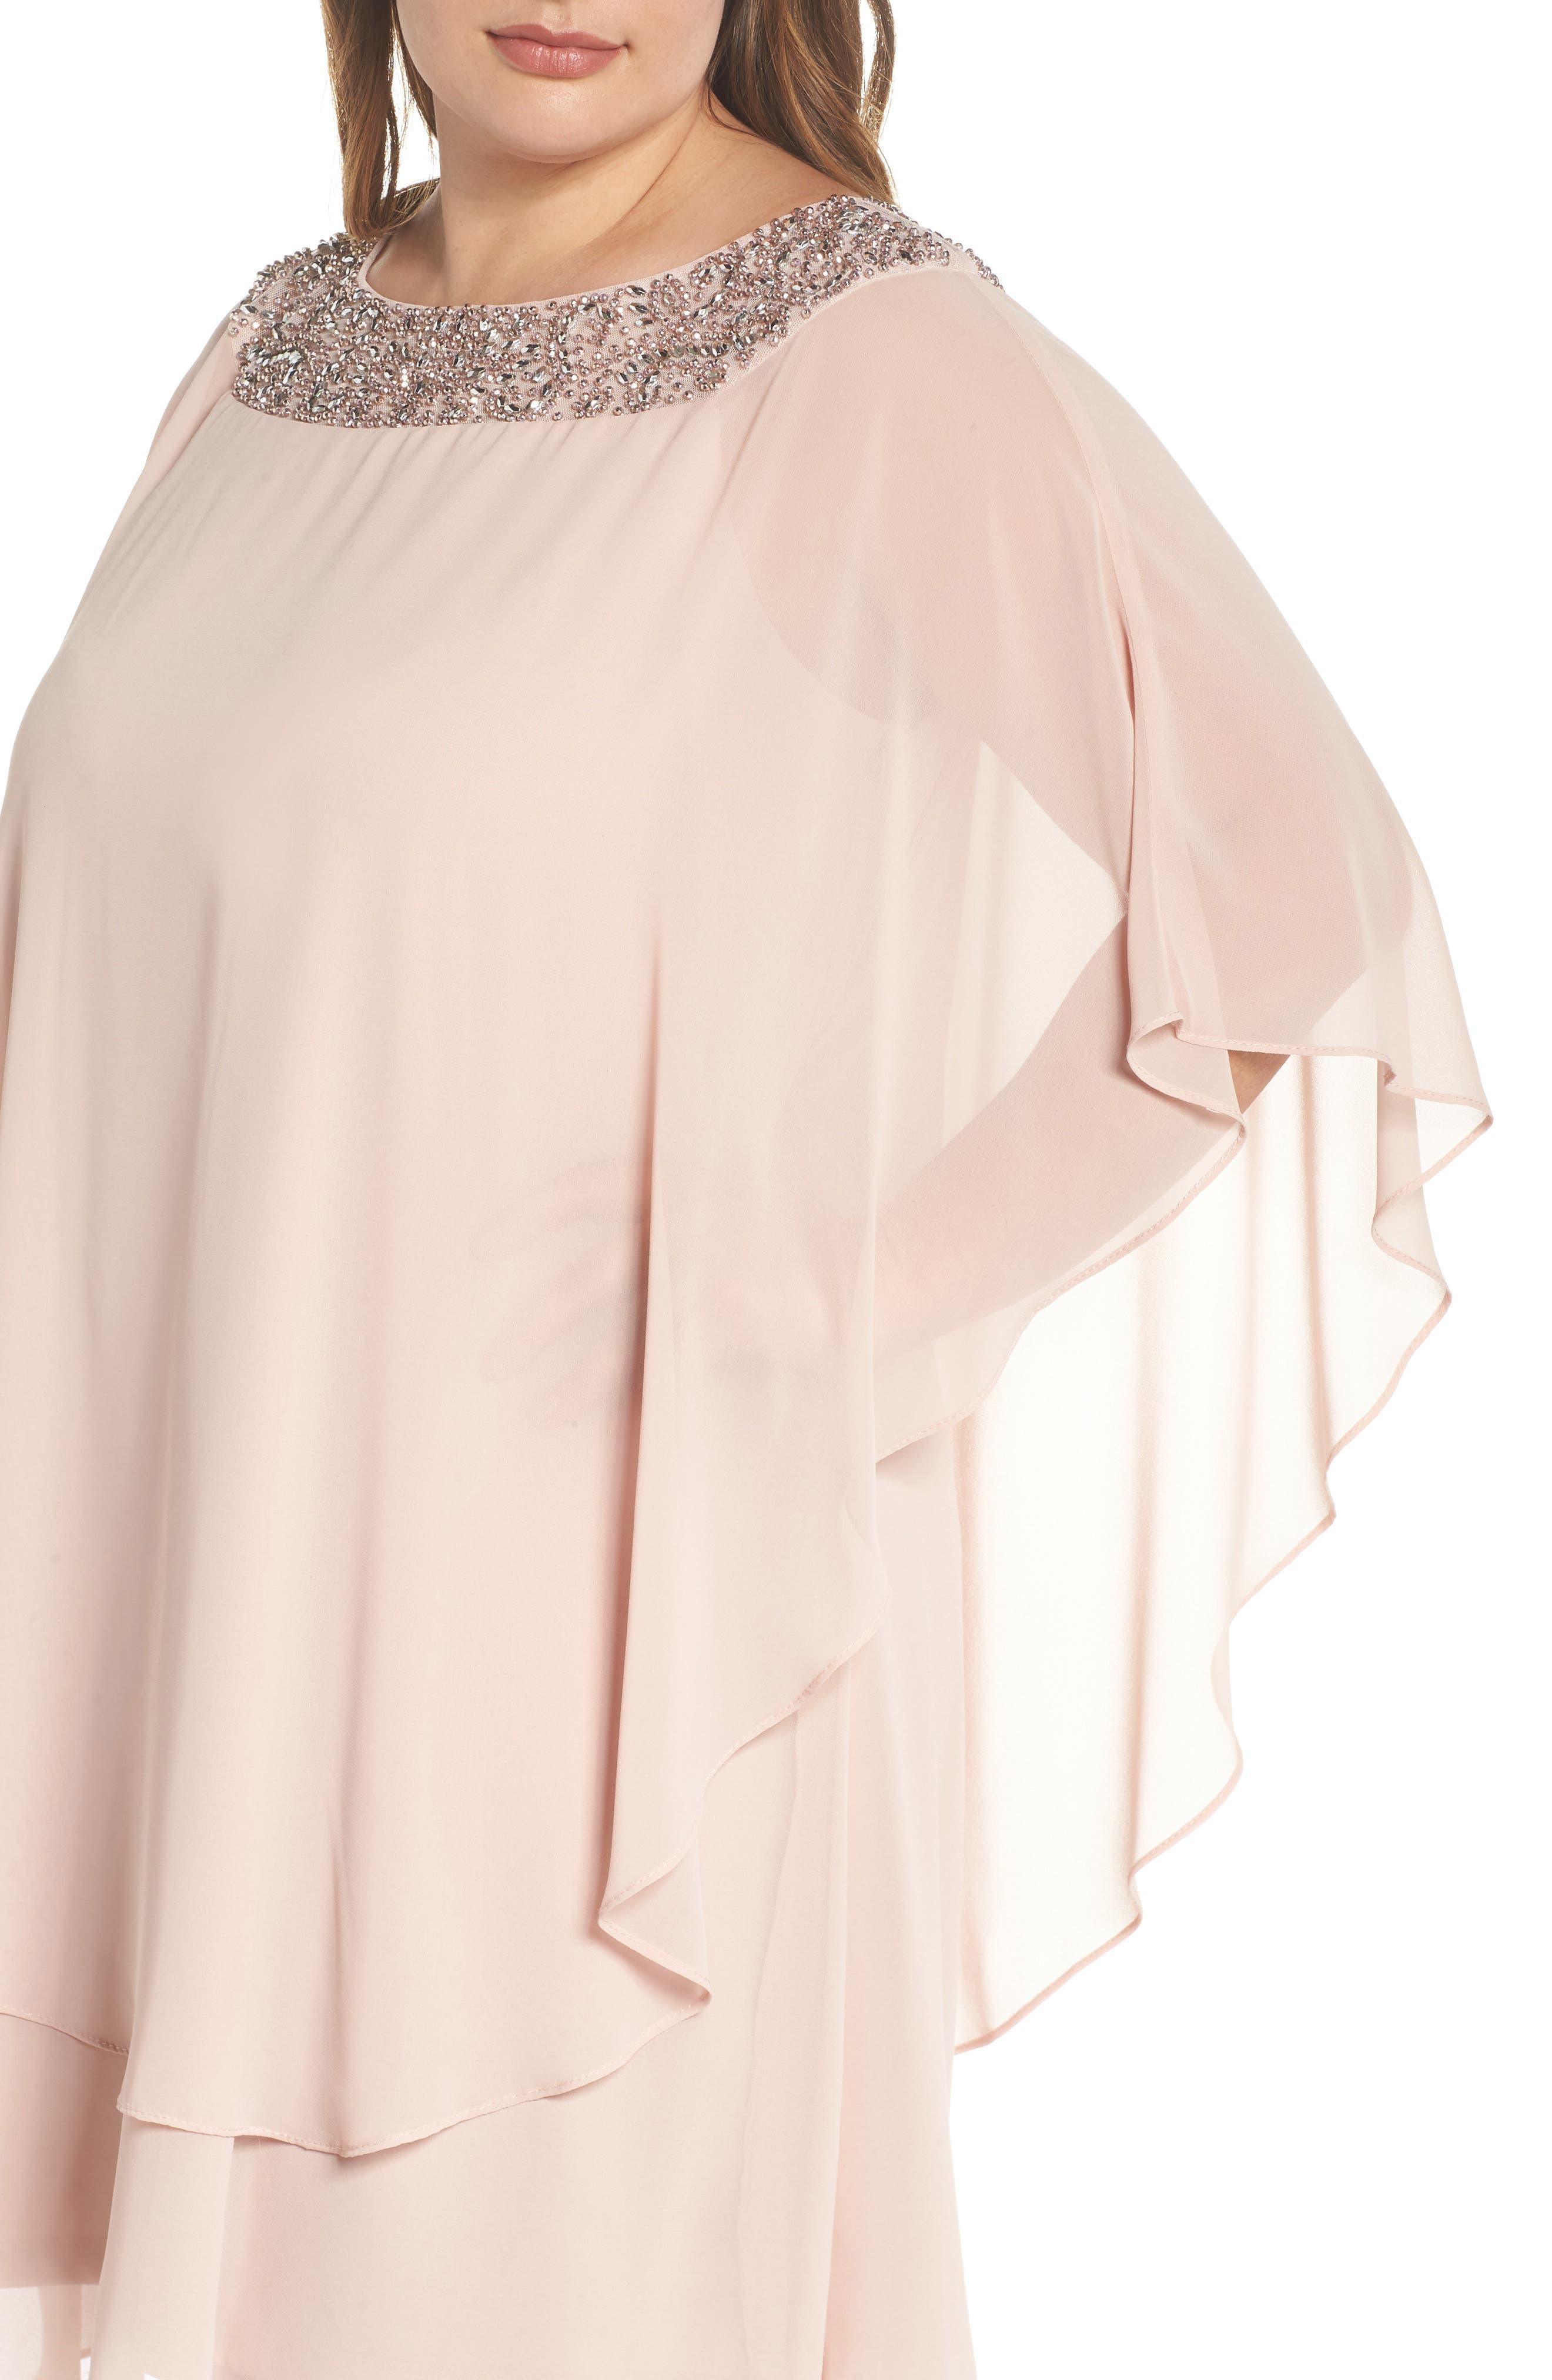 XSCAPE, Beaded Neck Chiffon Overlay Dress, Alternate thumbnail 5, color, BLUSH/ SILVER